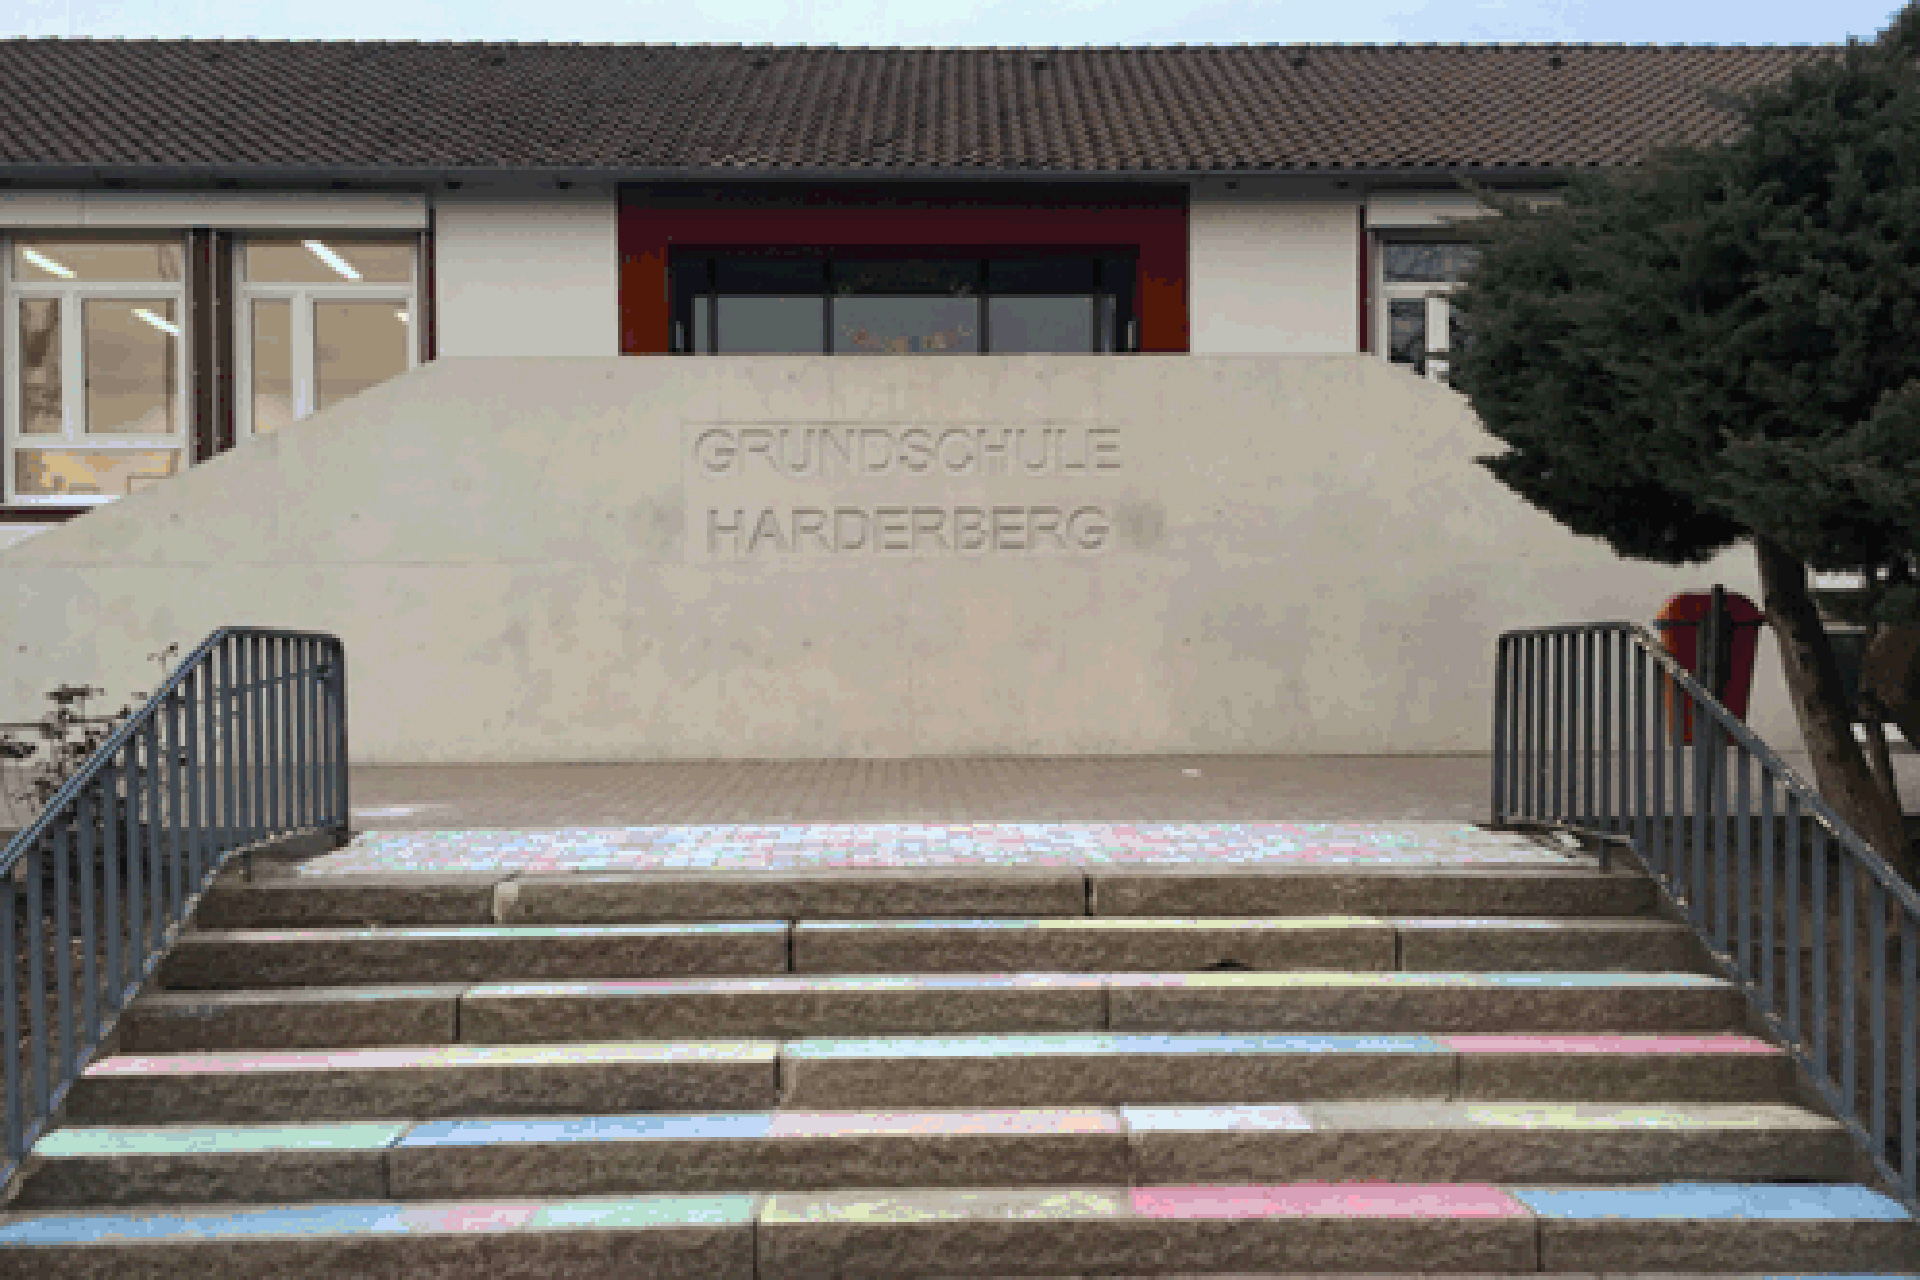 Grundschule Harderberg macht Baukultur